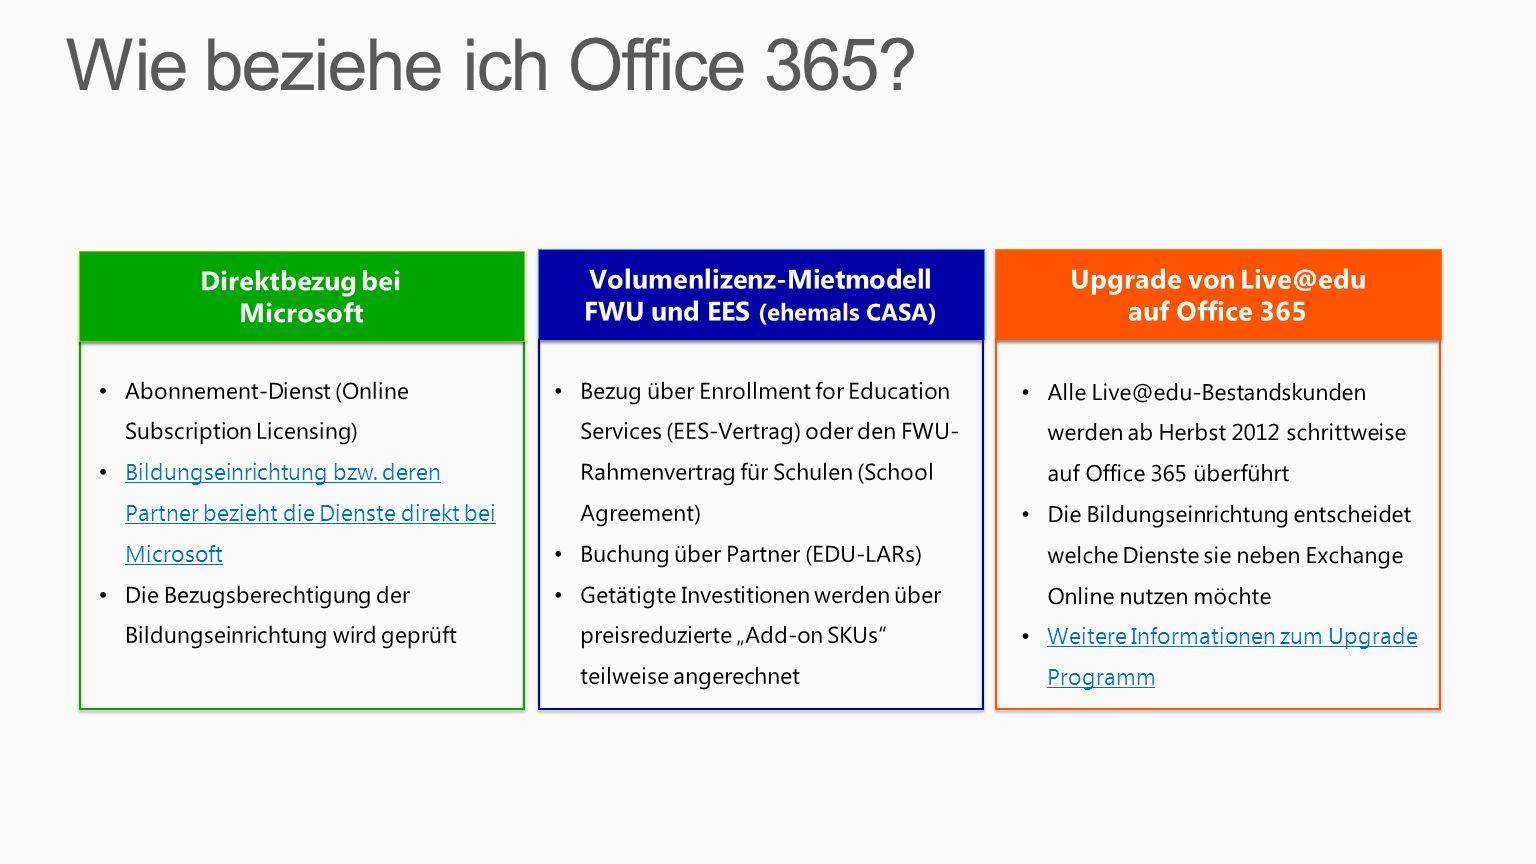 Direktbezug bei Microsoft